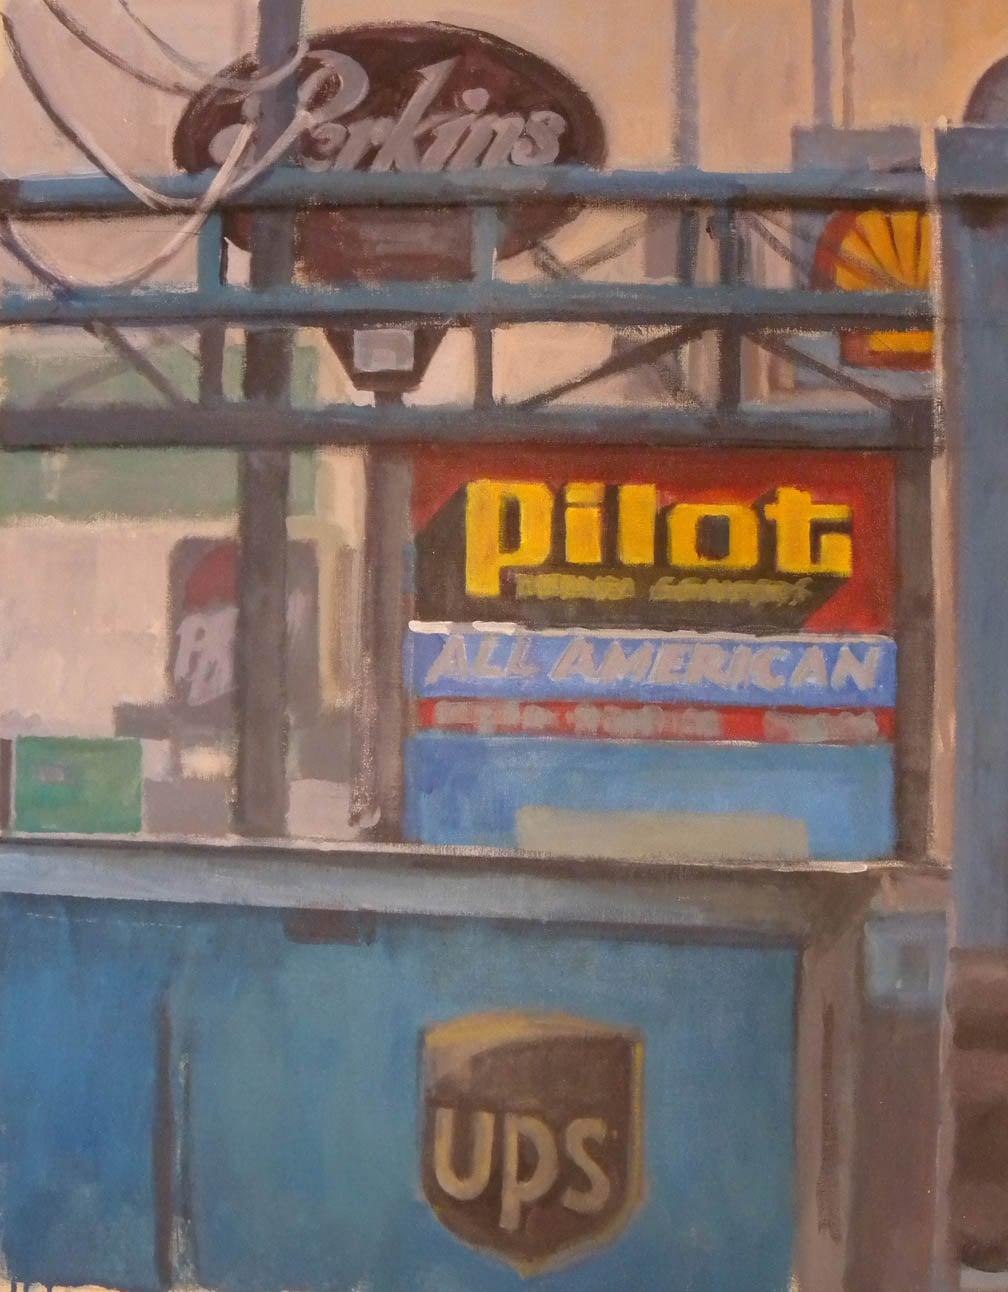 "Pilot All American,acrylic on canvas,37"" x 29 1/2"""